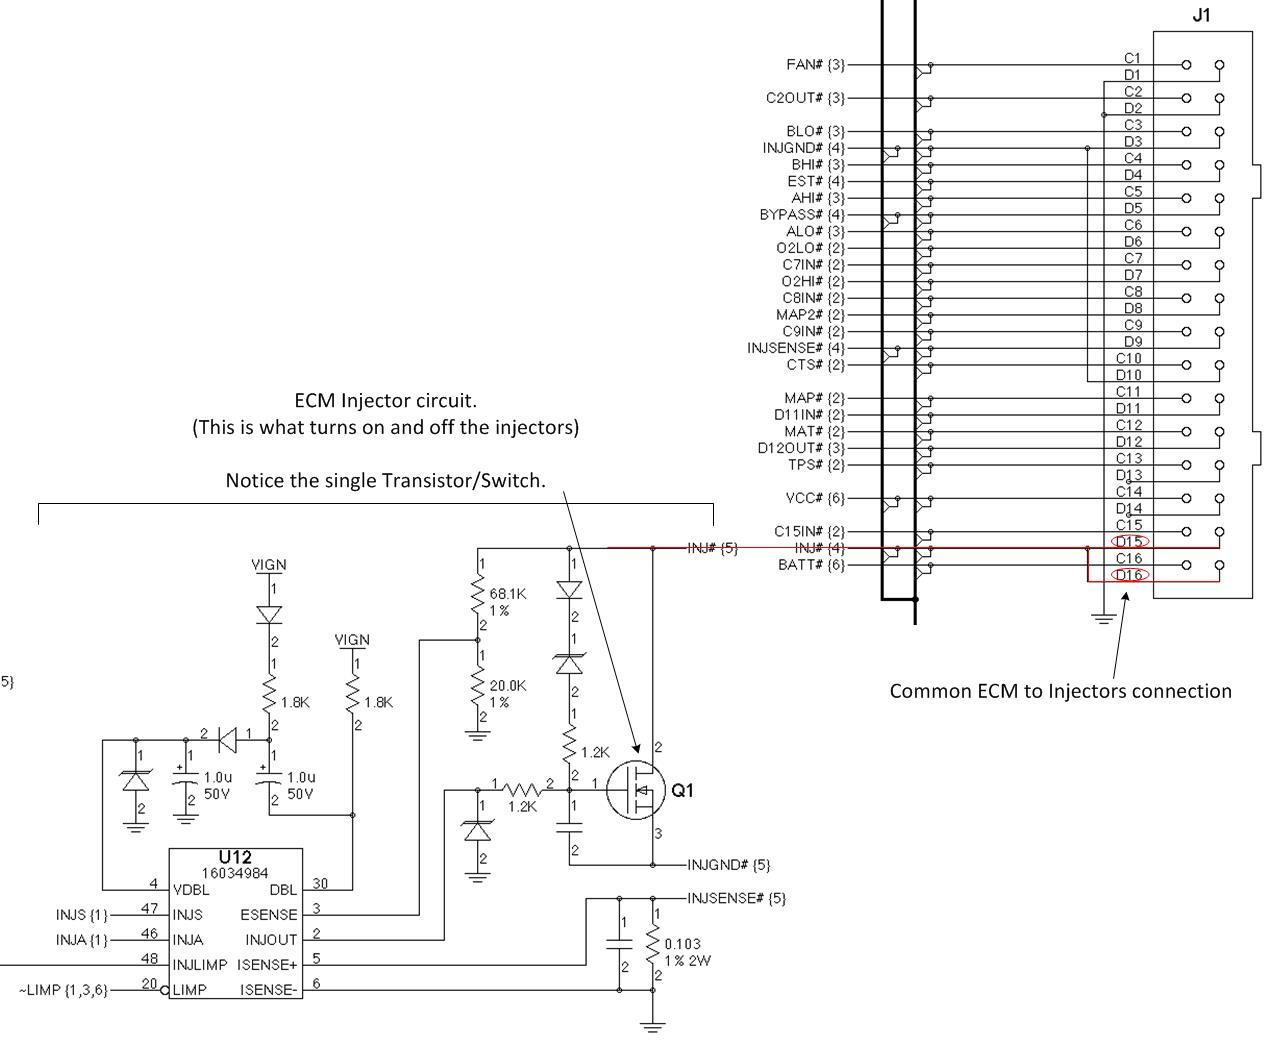 C7 Corvette Fuse Box Diagram. Corvette. Auto Wiring Diagram